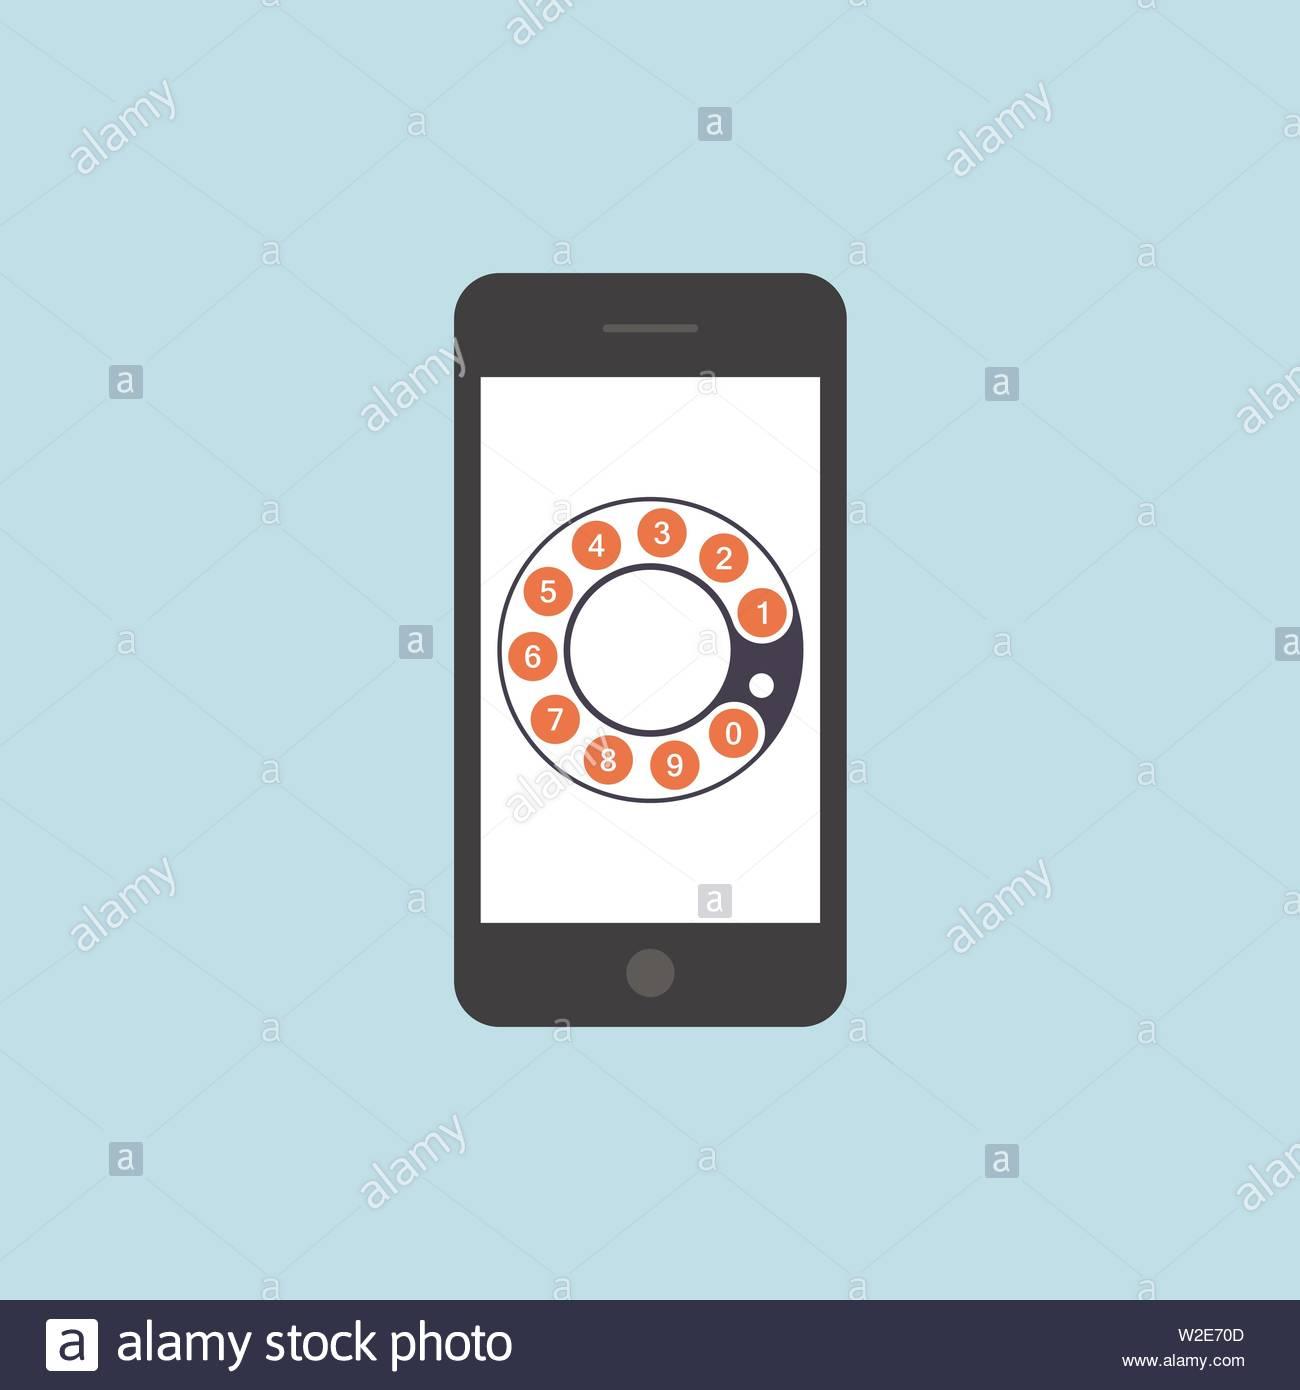 Keypad on smartphone screen. Mobile phone call. Flat vector illustration - Illustratio - Stock Image